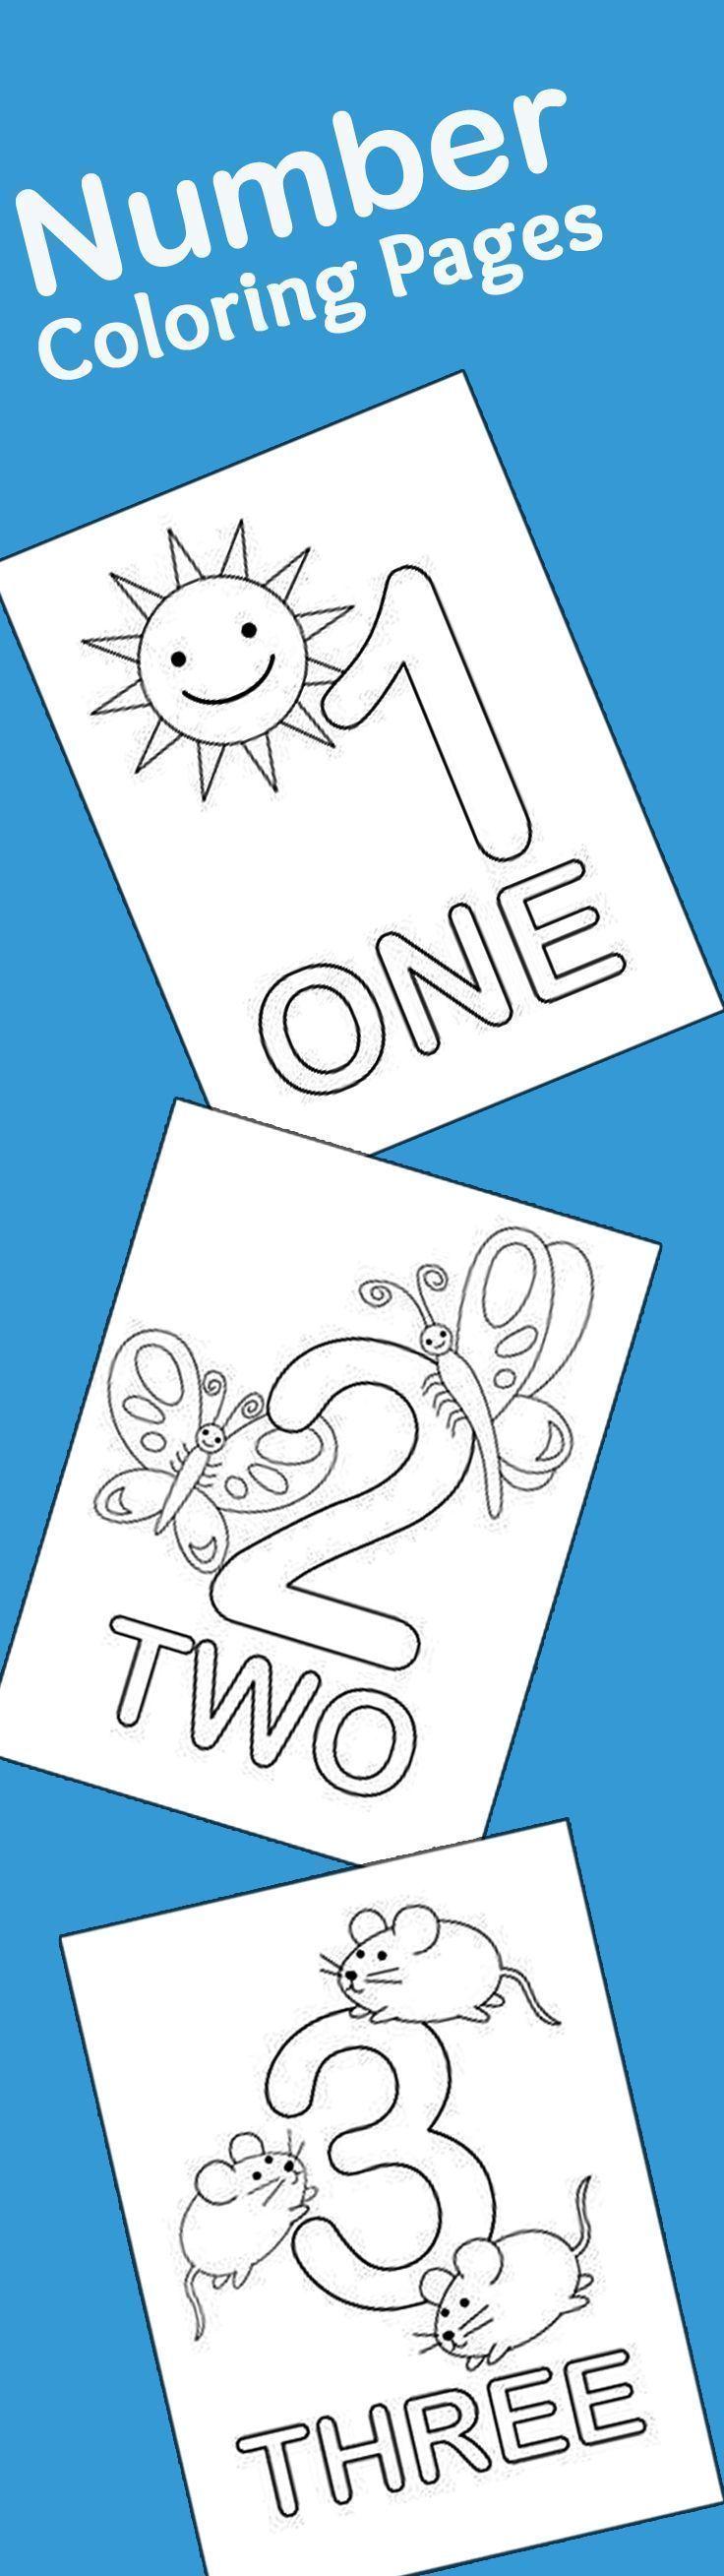 Top free printable number coloring pages online free printable